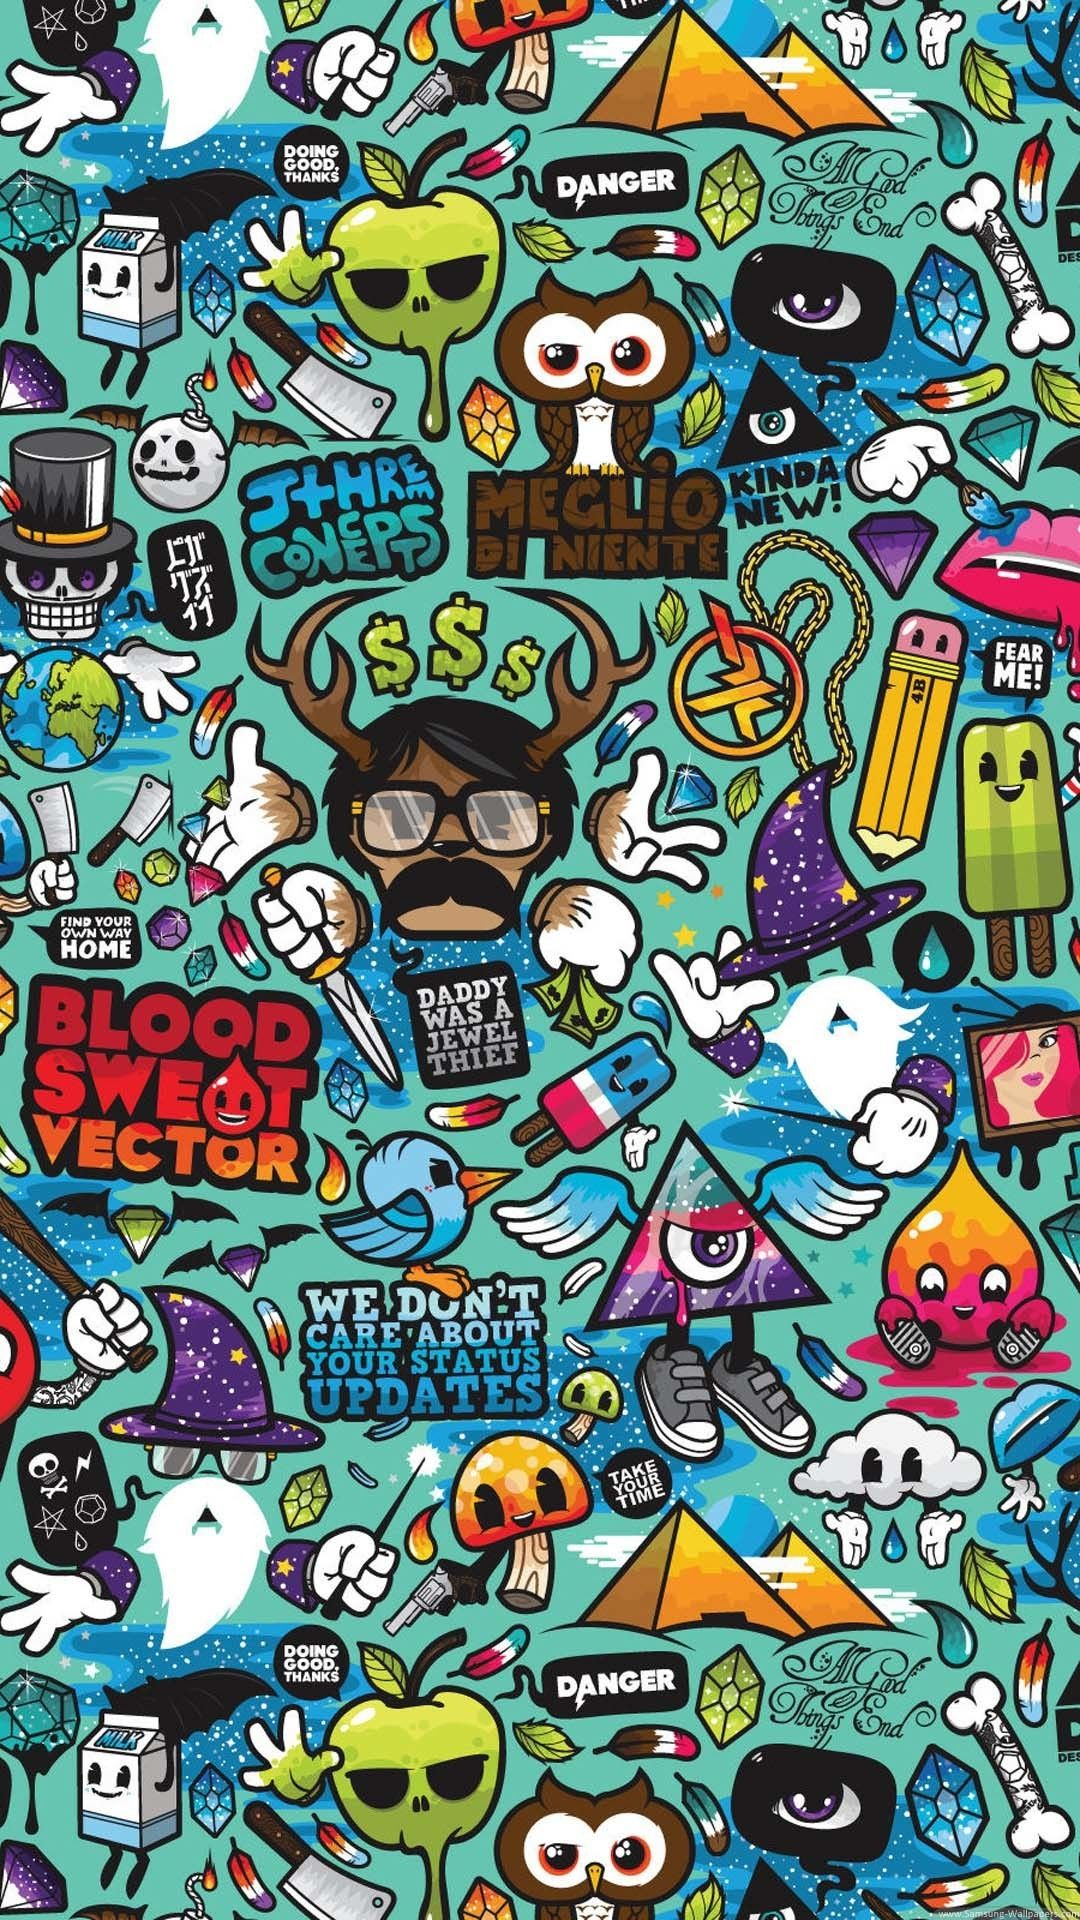 1080x1920 Hd Wallpaper Portrait 79 Images With Cartoon Hd Wallpapers Vertical Cartoon Wallpaper Hd Funky Wallpaper Graffiti Wallpaper